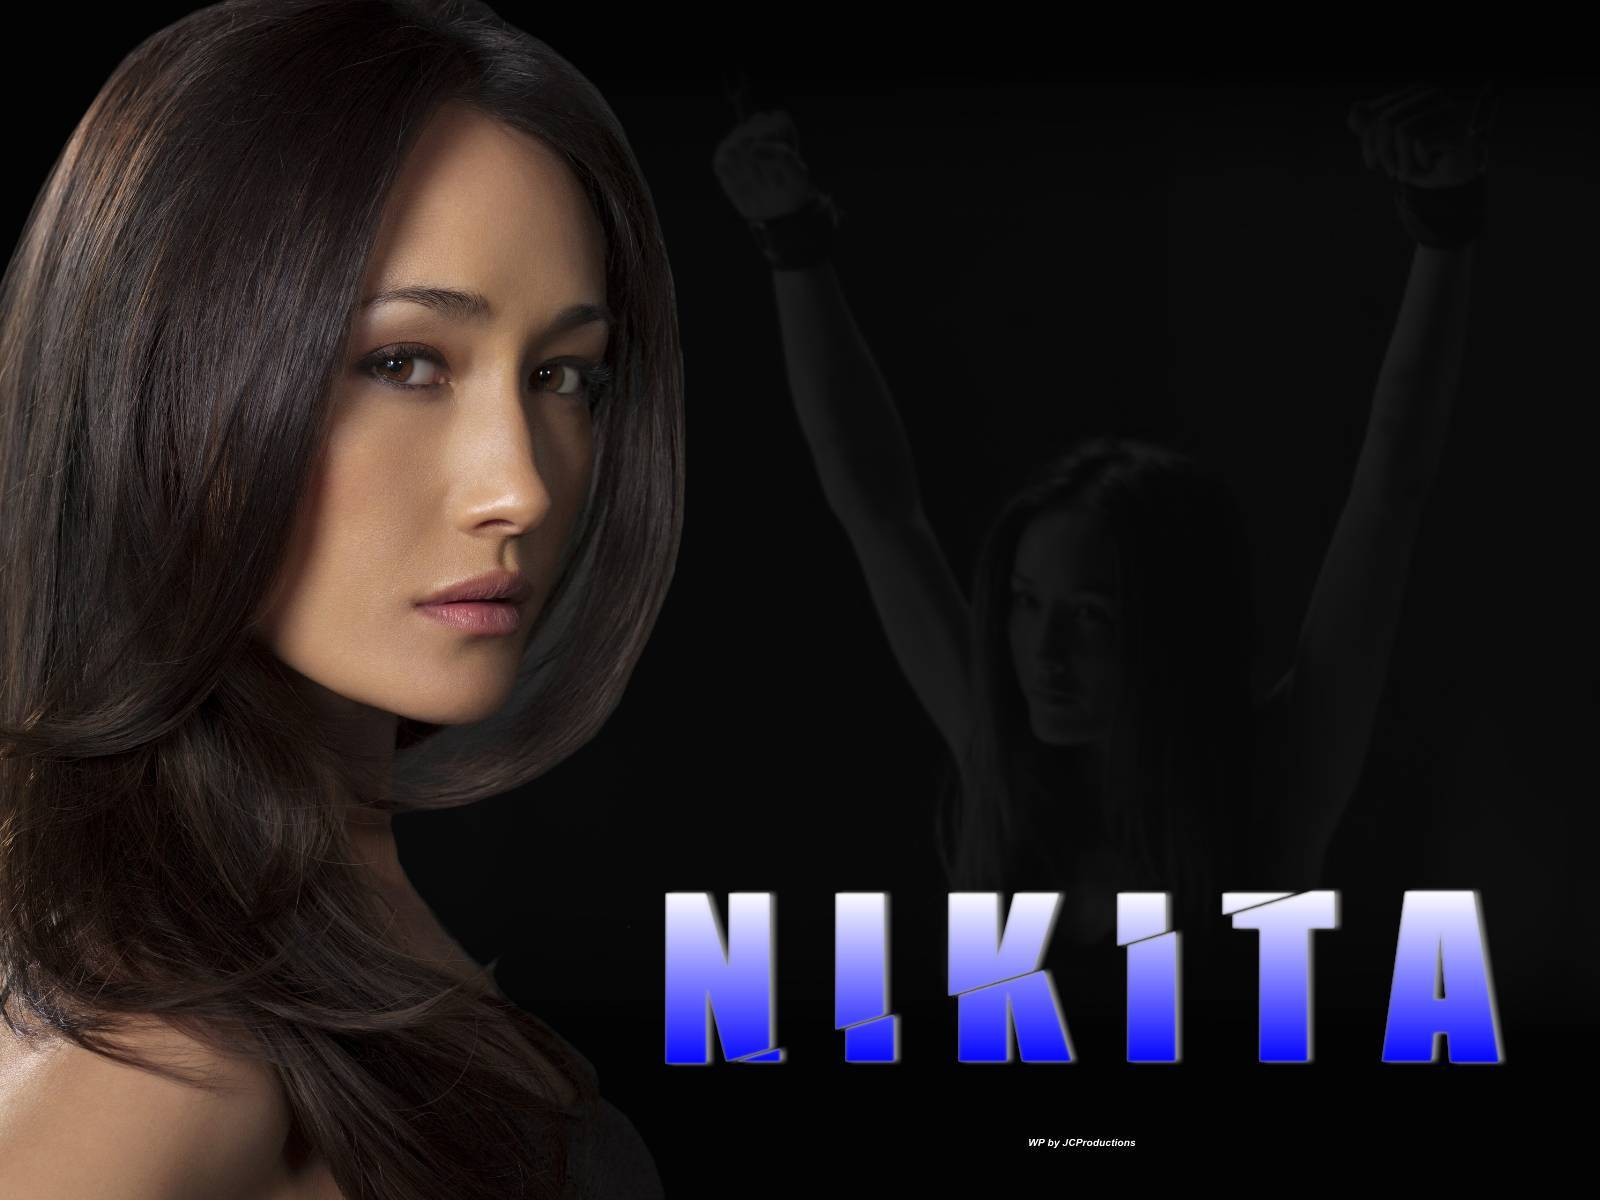 Nikita season 5 release date in Melbourne